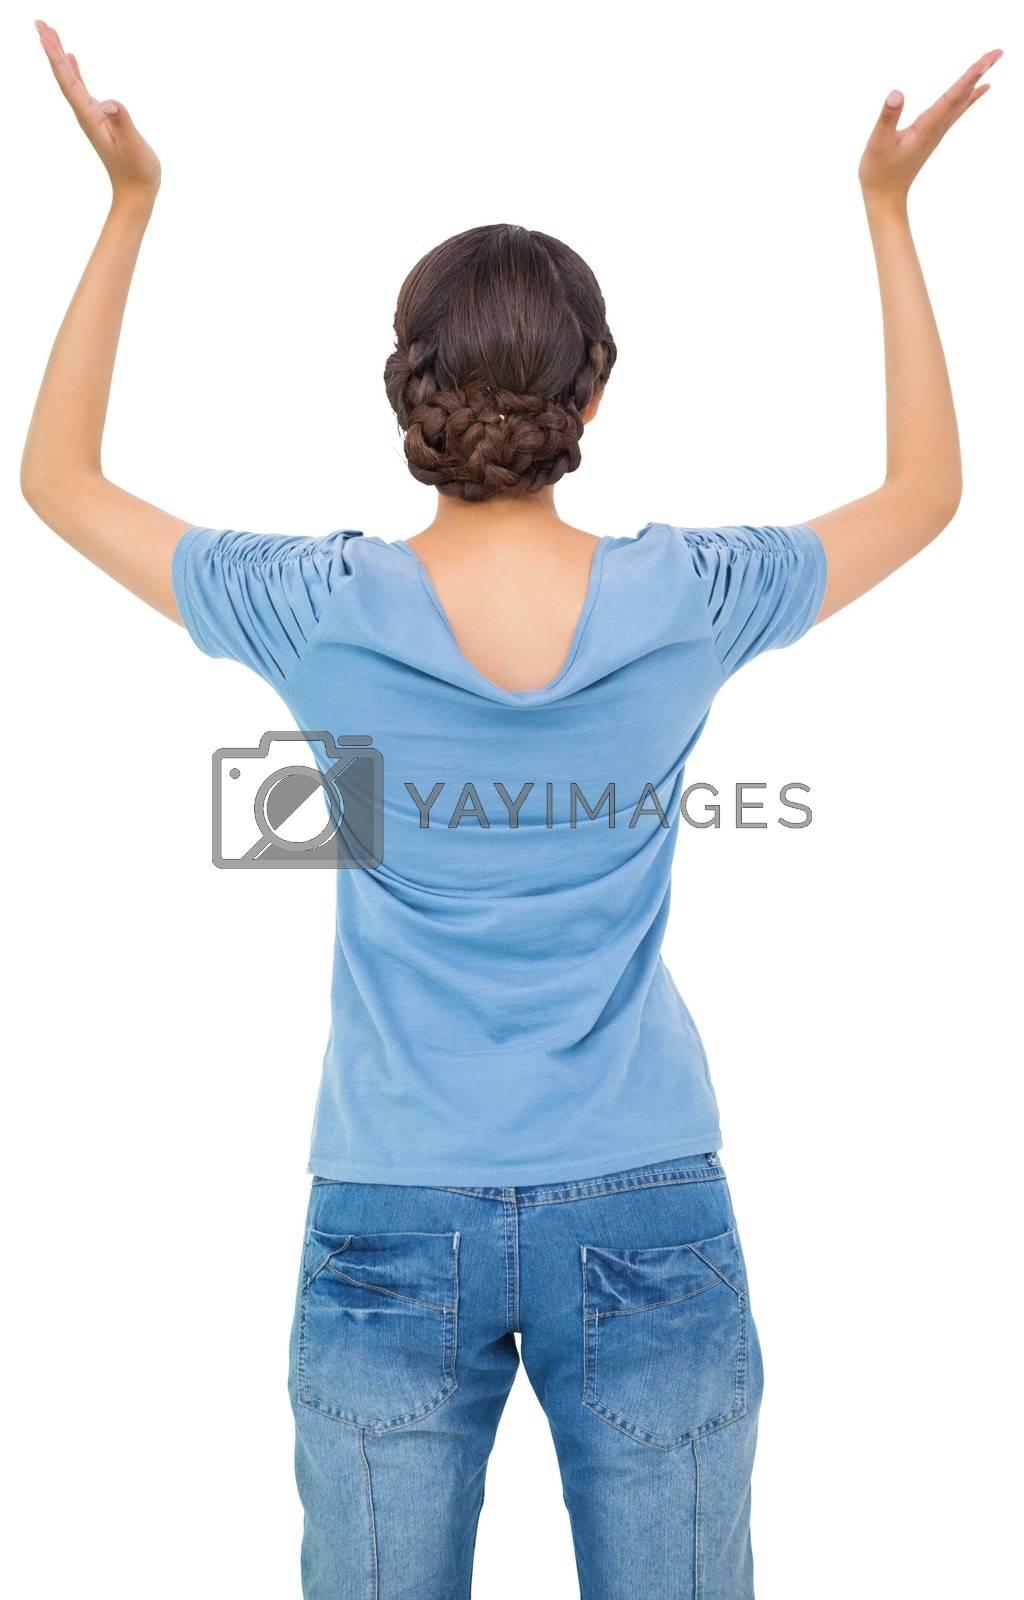 Royalty free image of Brunette woman in jeans gesturing by Wavebreakmedia